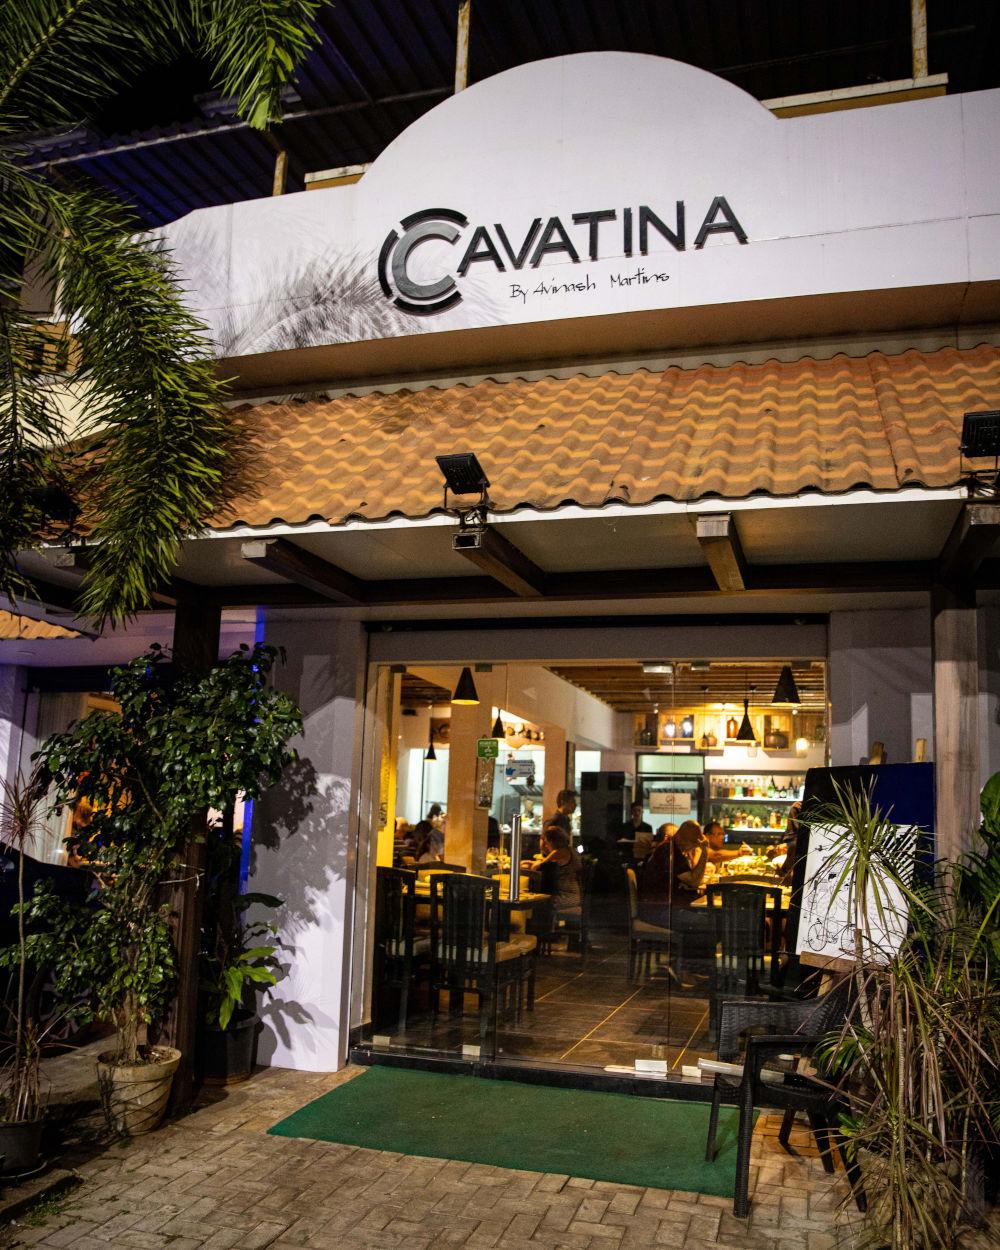 Entrance at Cavatina in Goa